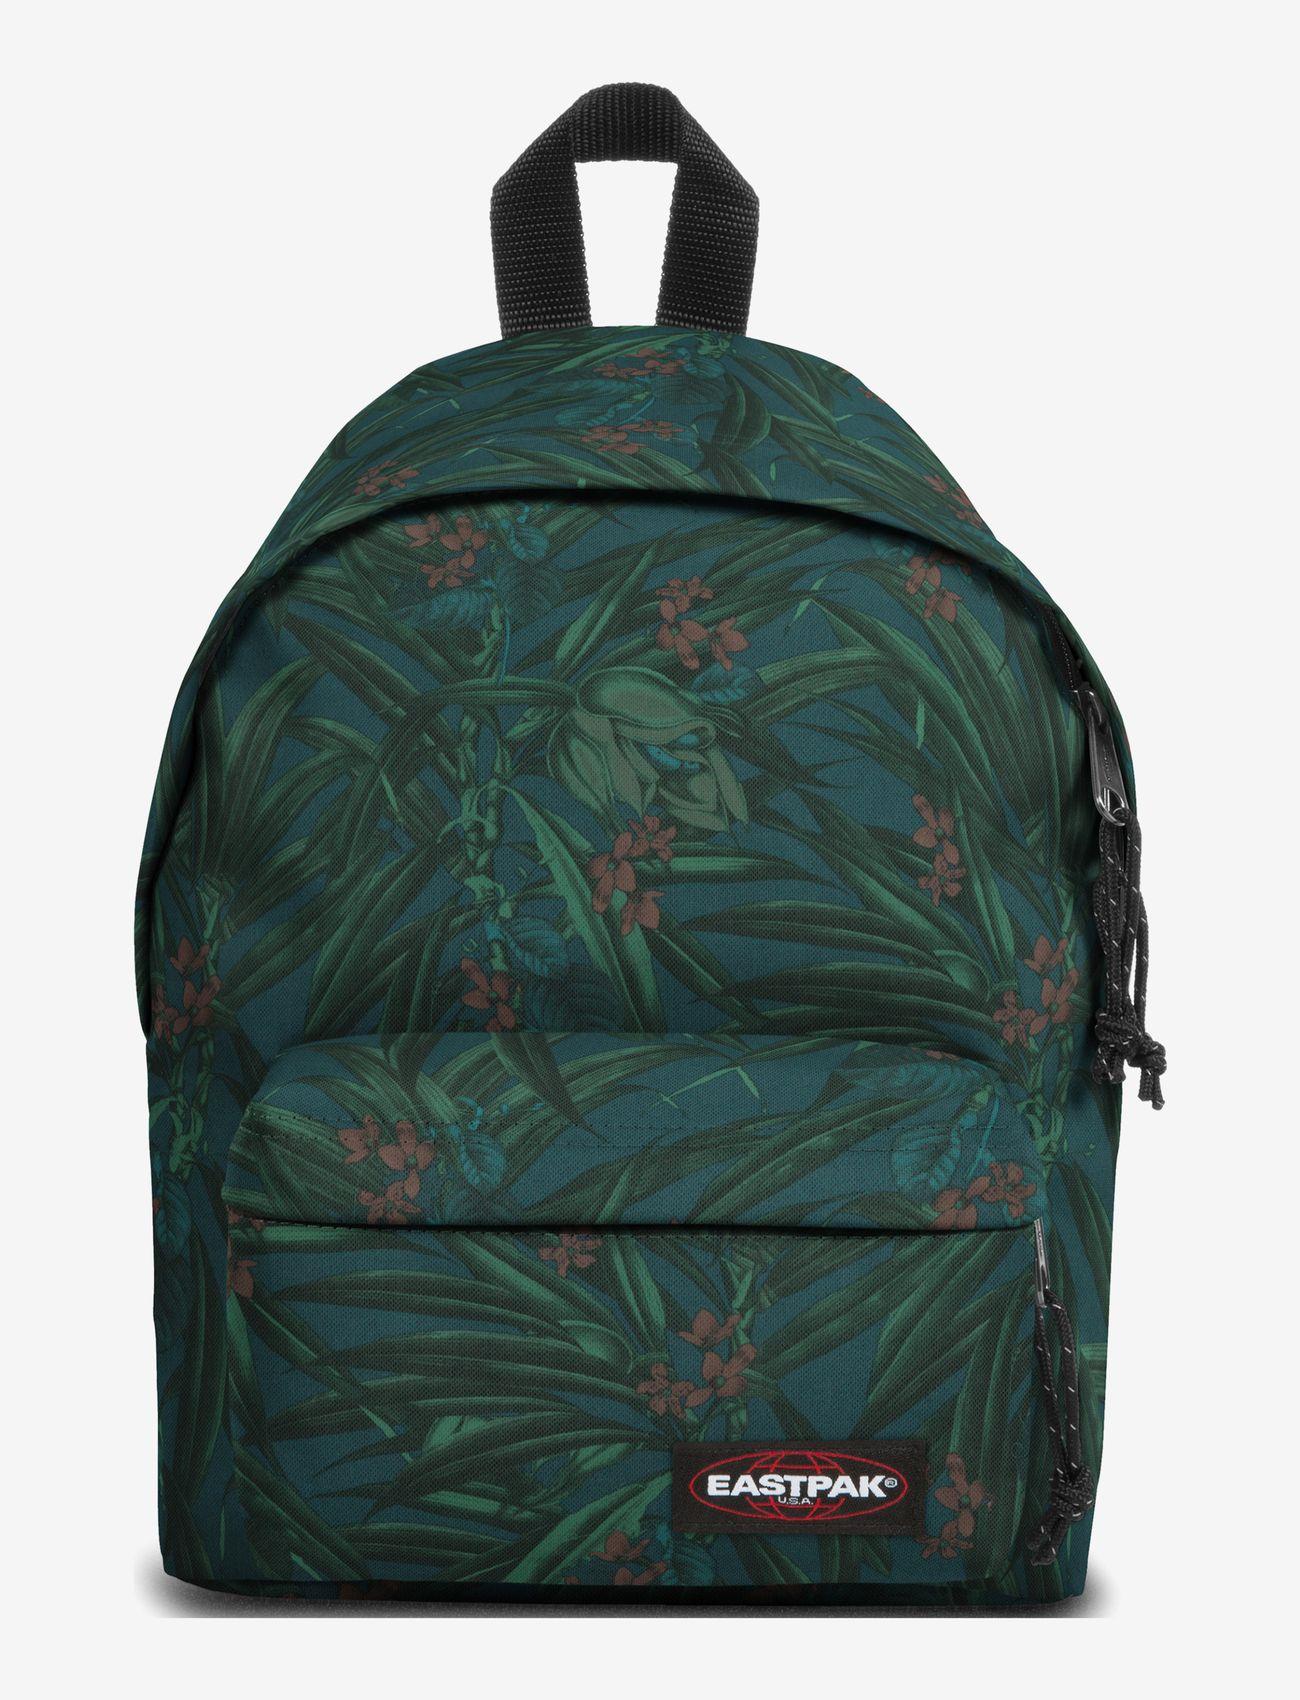 Eastpak - ORBIT - rucksäcke - brize mel dark - 0